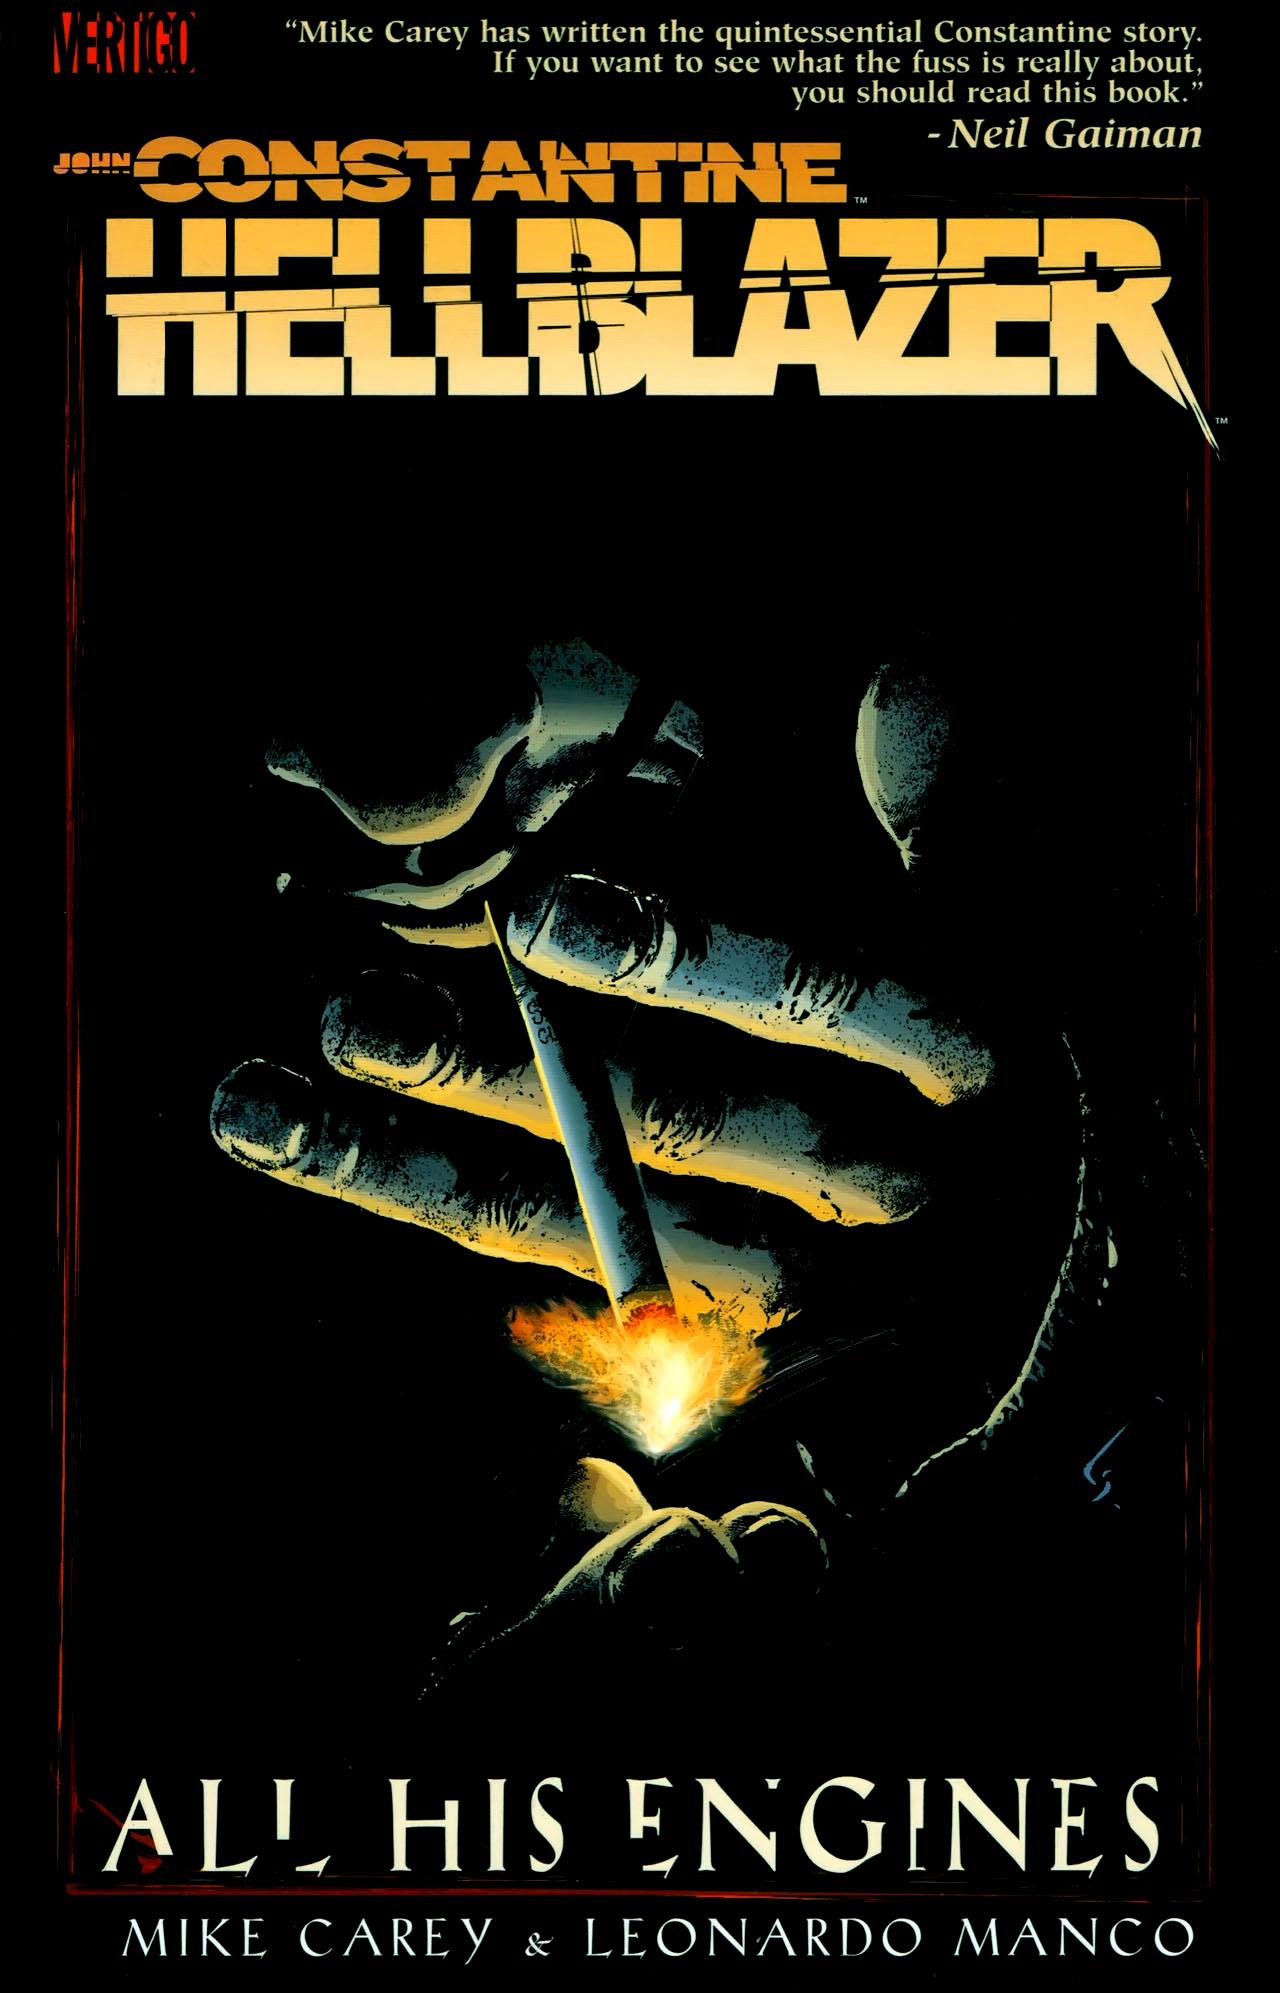 Read online John Constantine Hellblazer: All His Engines comic -  Issue # Full - 1